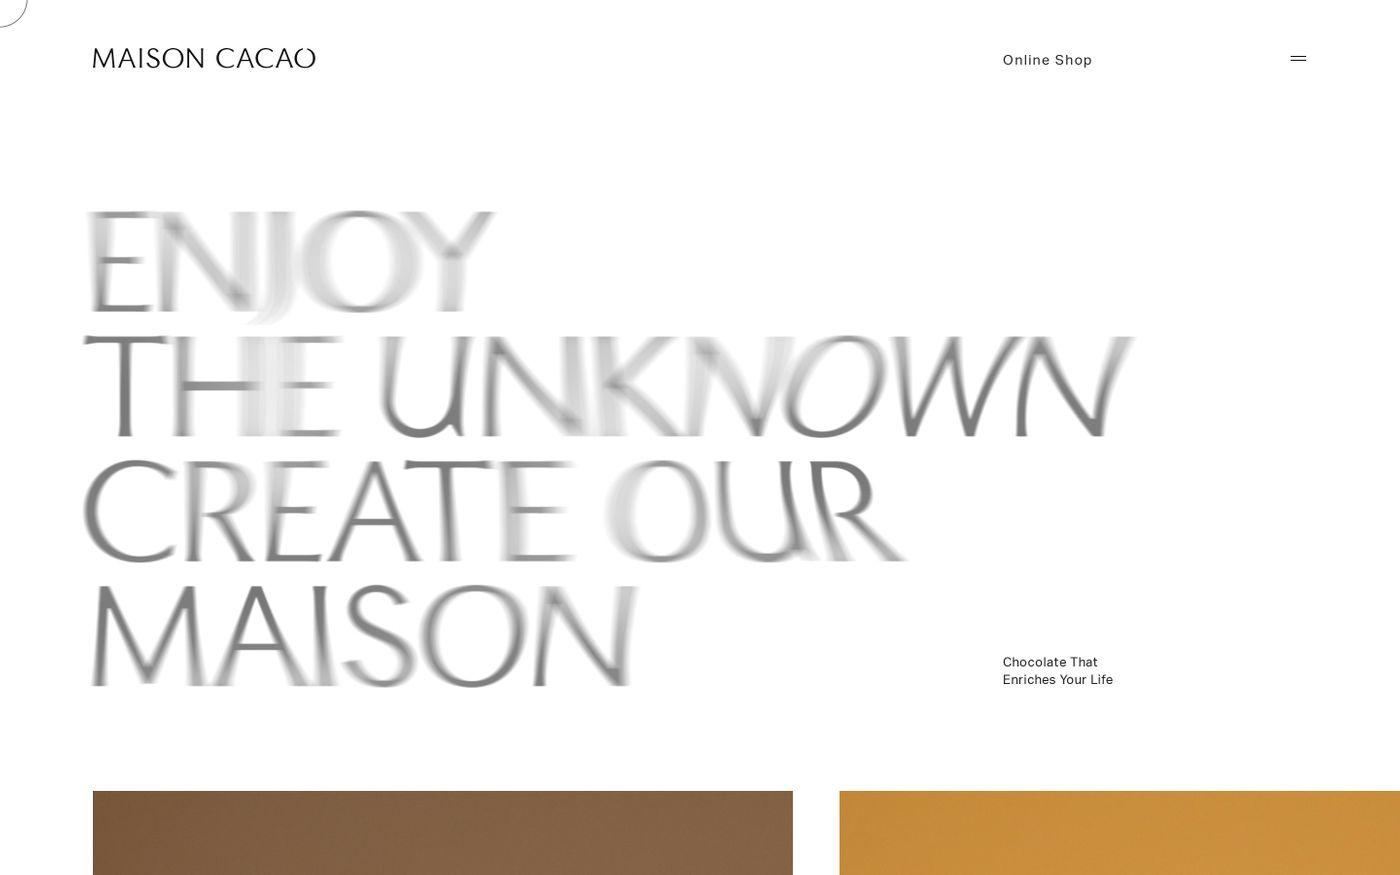 Screenshot of MAISON CACAO公式ブランドサイト website